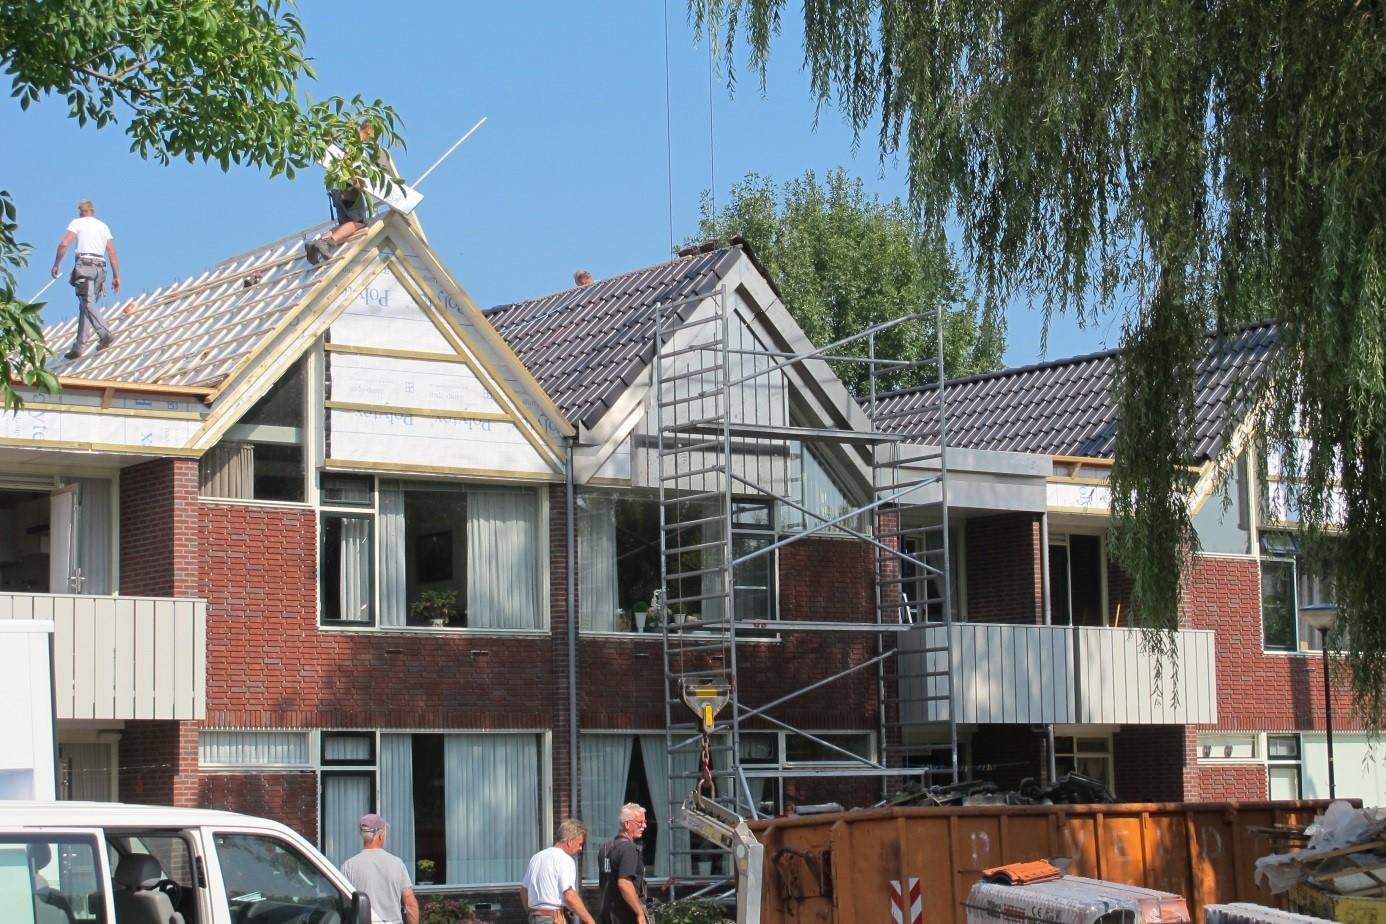 Woningstichting isoleert 82 woningen op Volendam